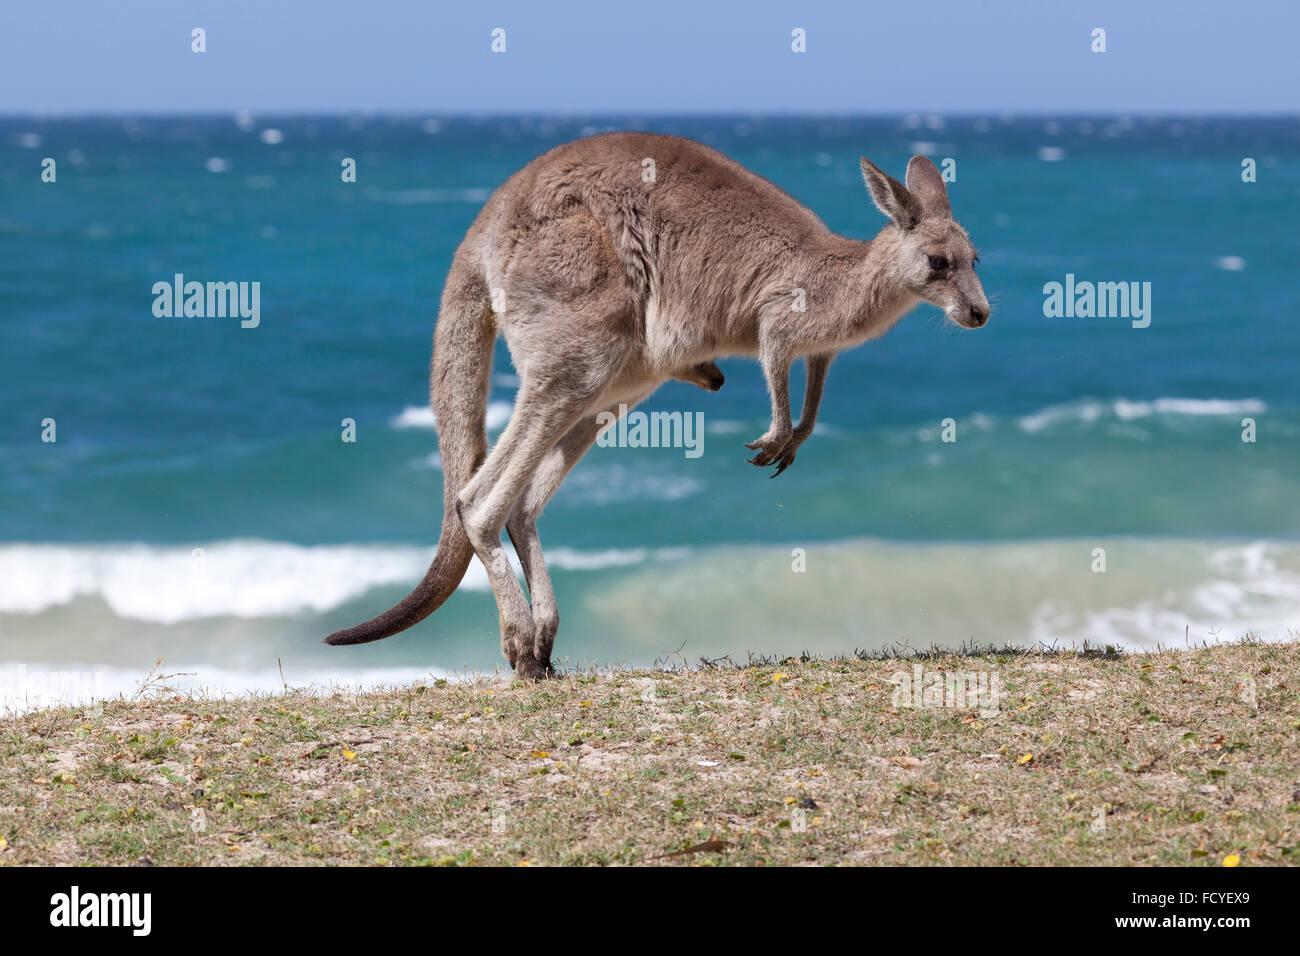 Jumping Red Kangaroo on the beach, Depot Beach,New South Wales, Australia - Stock Image